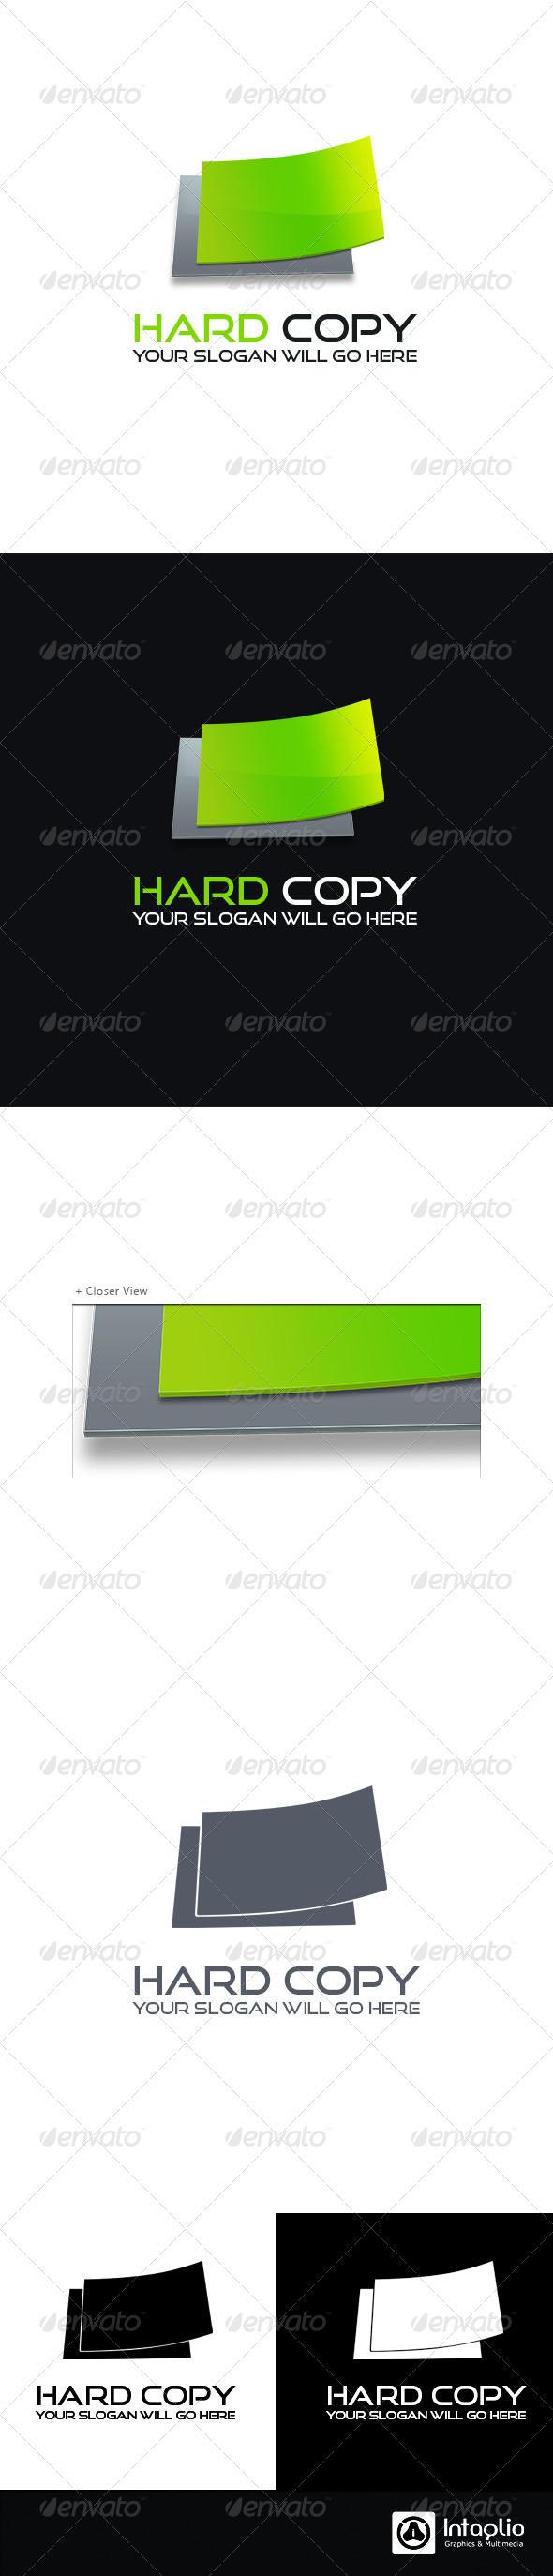 Print Logo - Hard Copy - 3d Abstract